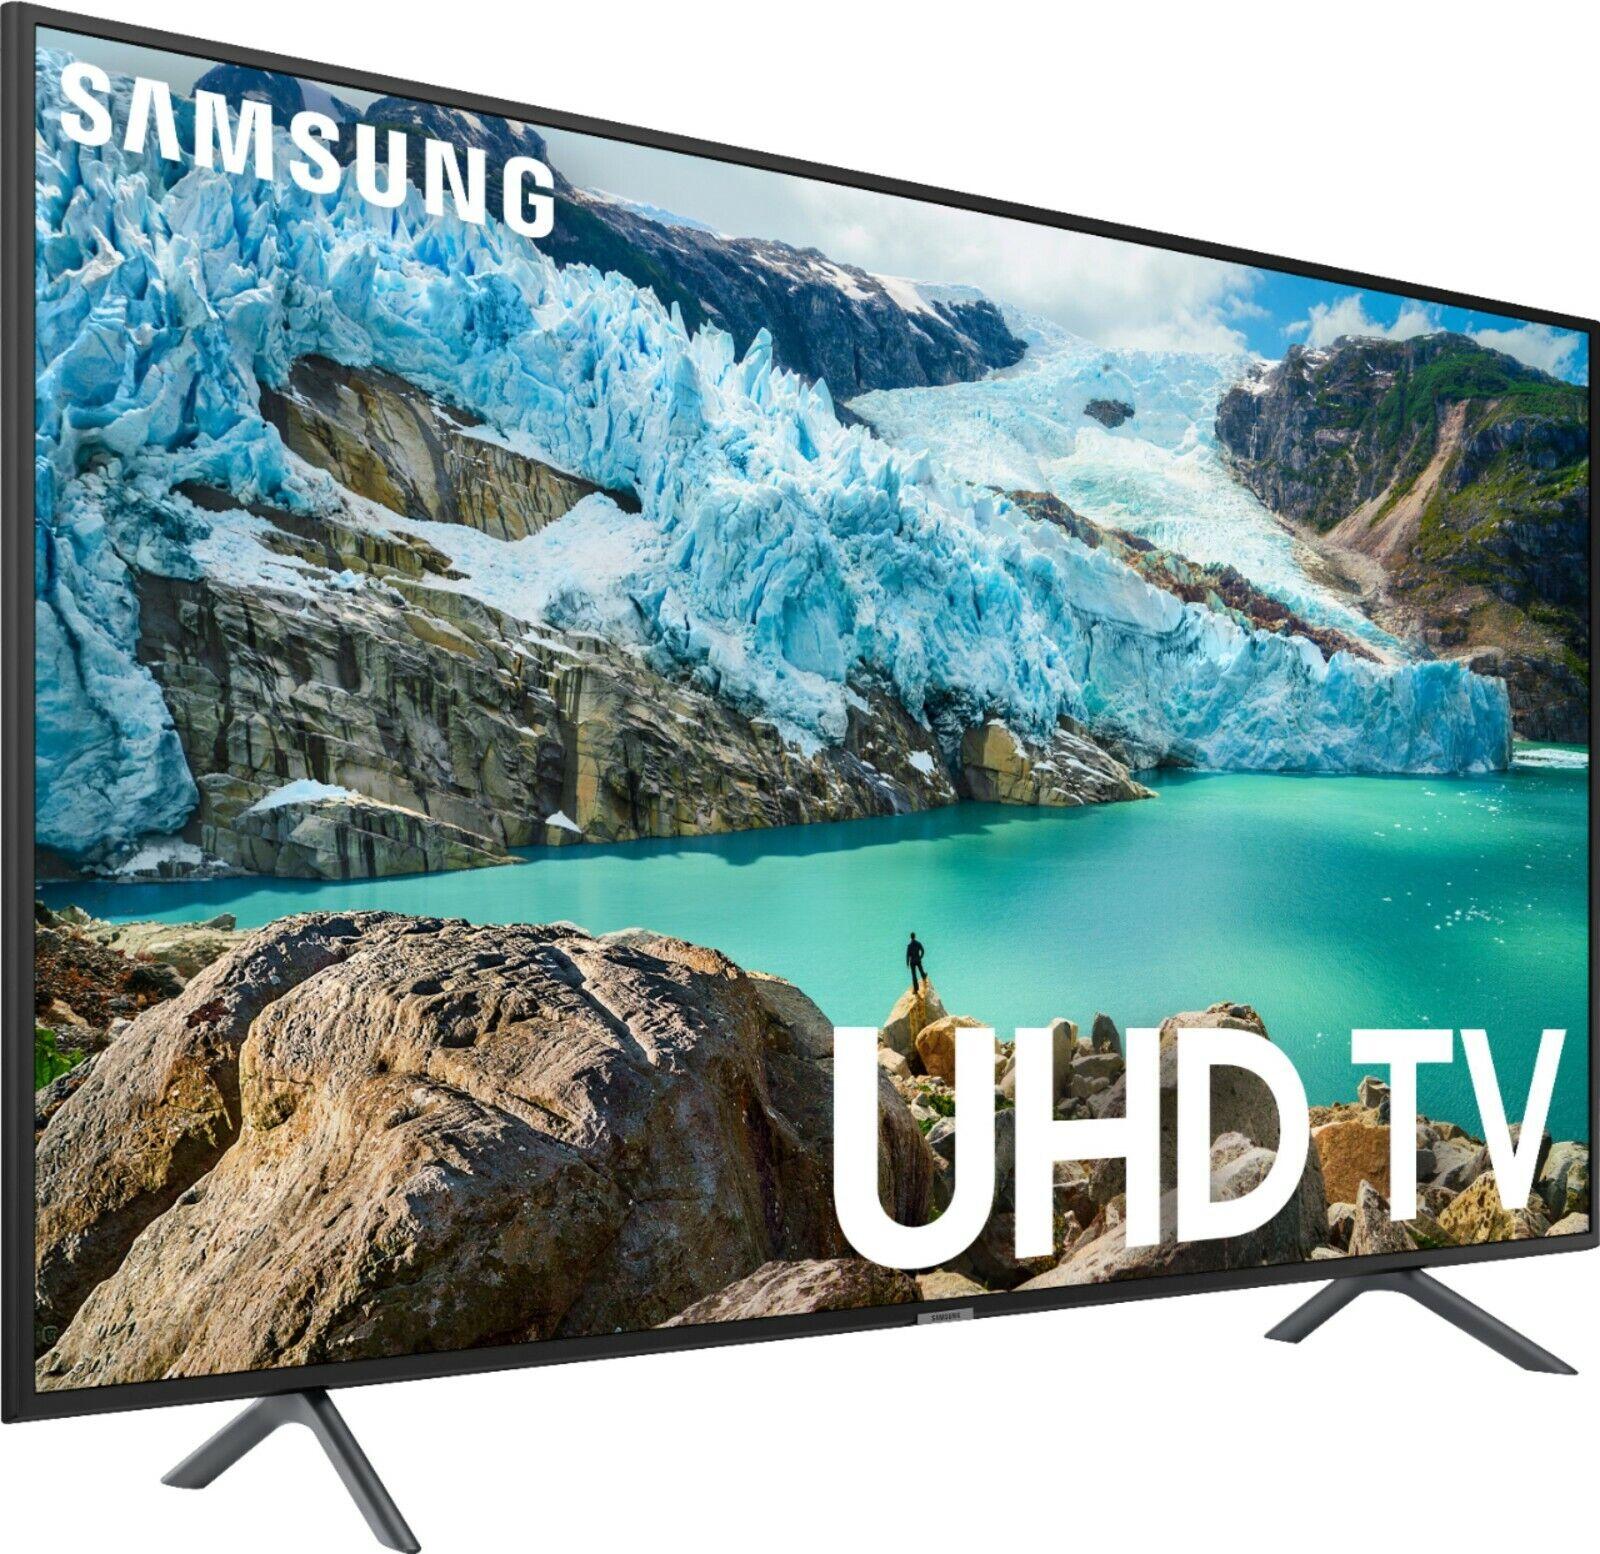 "Samsung UN43RU7100FXZA 43"" Class LED 7 Series 2160p Smart 4K"